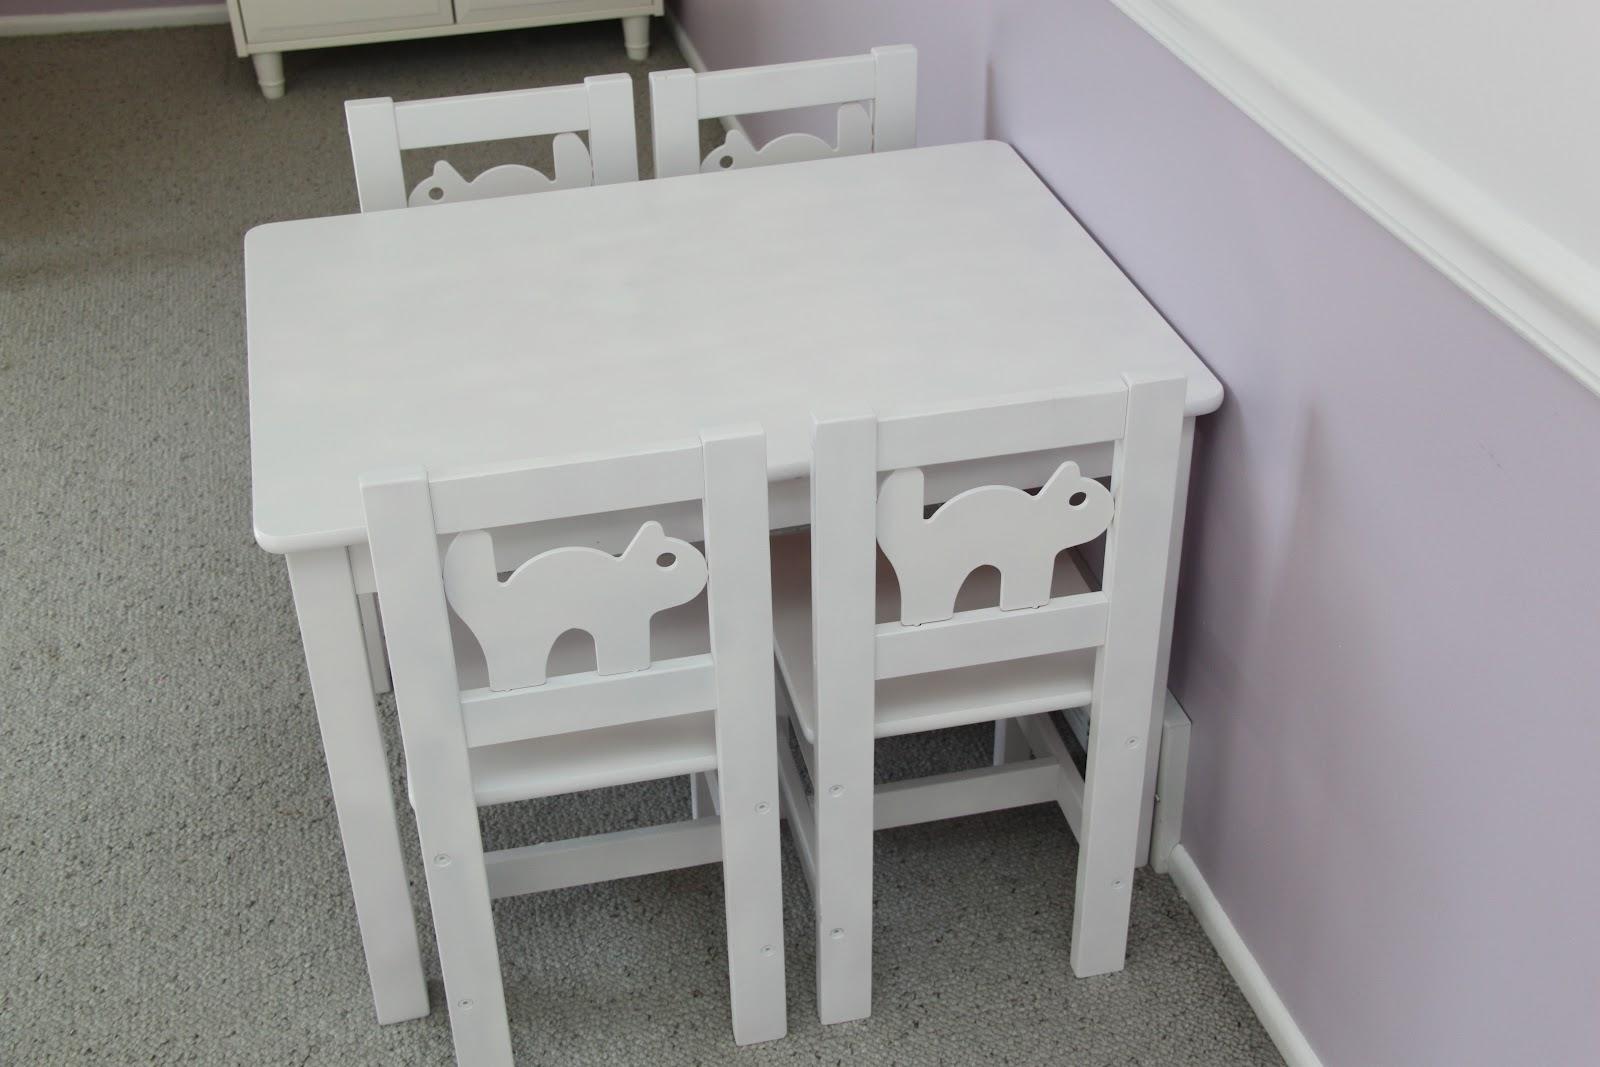 how to paint ikea laminate furniture tutorial smashed peas carrots. Black Bedroom Furniture Sets. Home Design Ideas